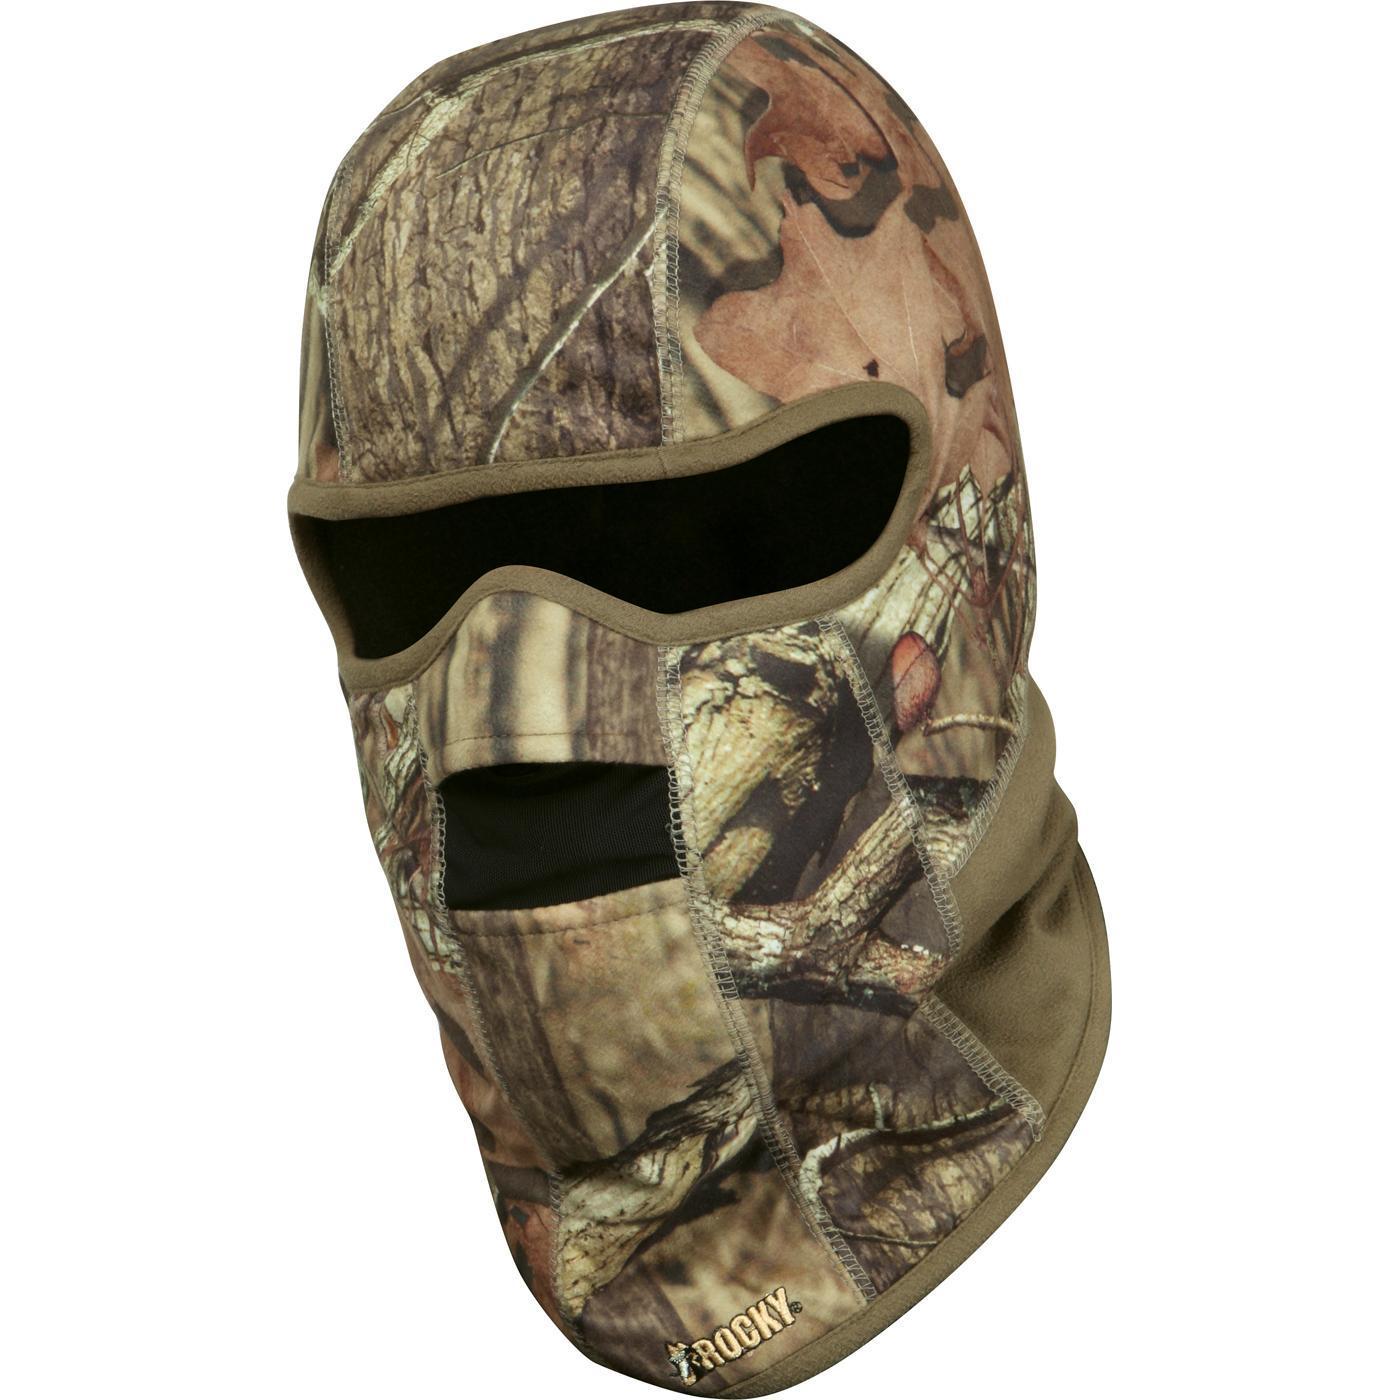 Rocky Camo Balaclava Face Mask W Thinsulate Insulation